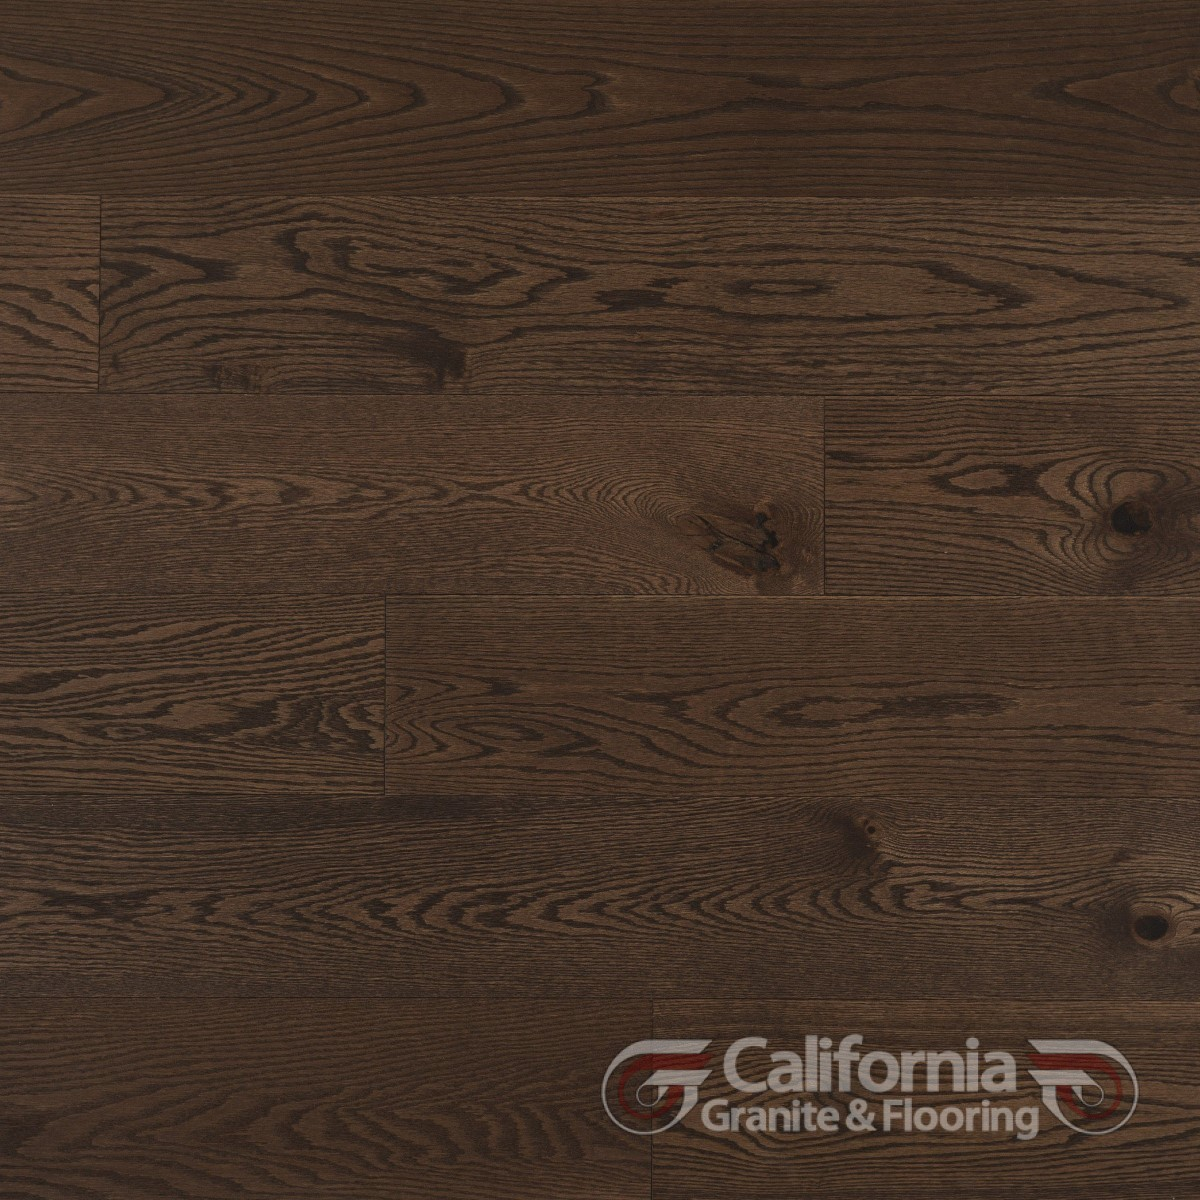 hardwood-flooring-red-oak-nightfall-character-brushed-herringbone-2